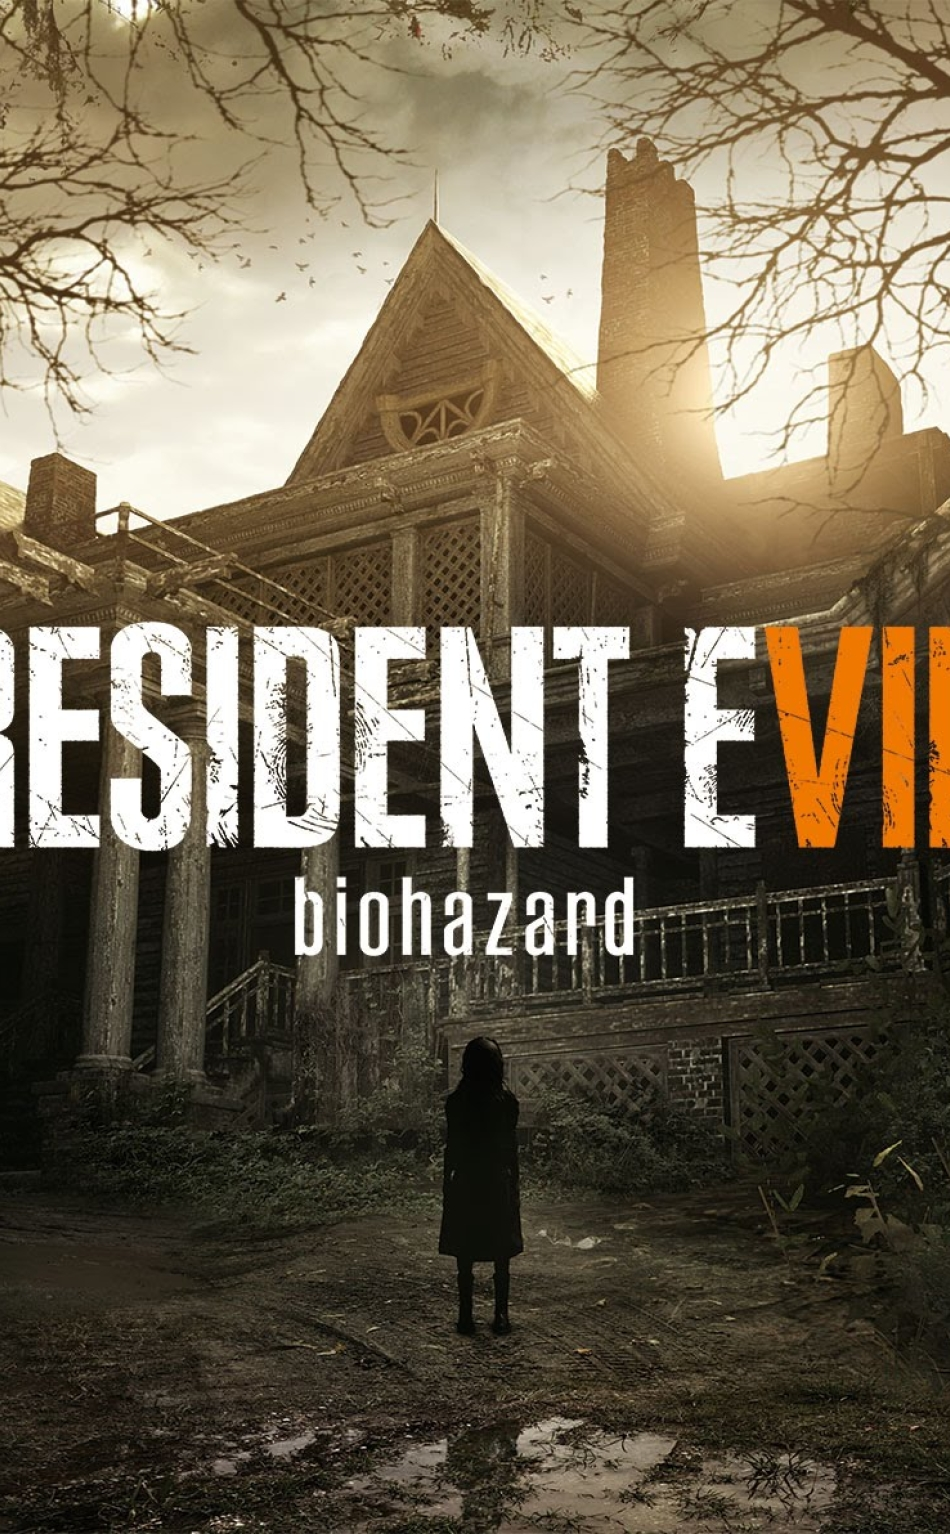 950x1534 Resident Evil 7 Biohazard Capcom 950x1534 Resolution